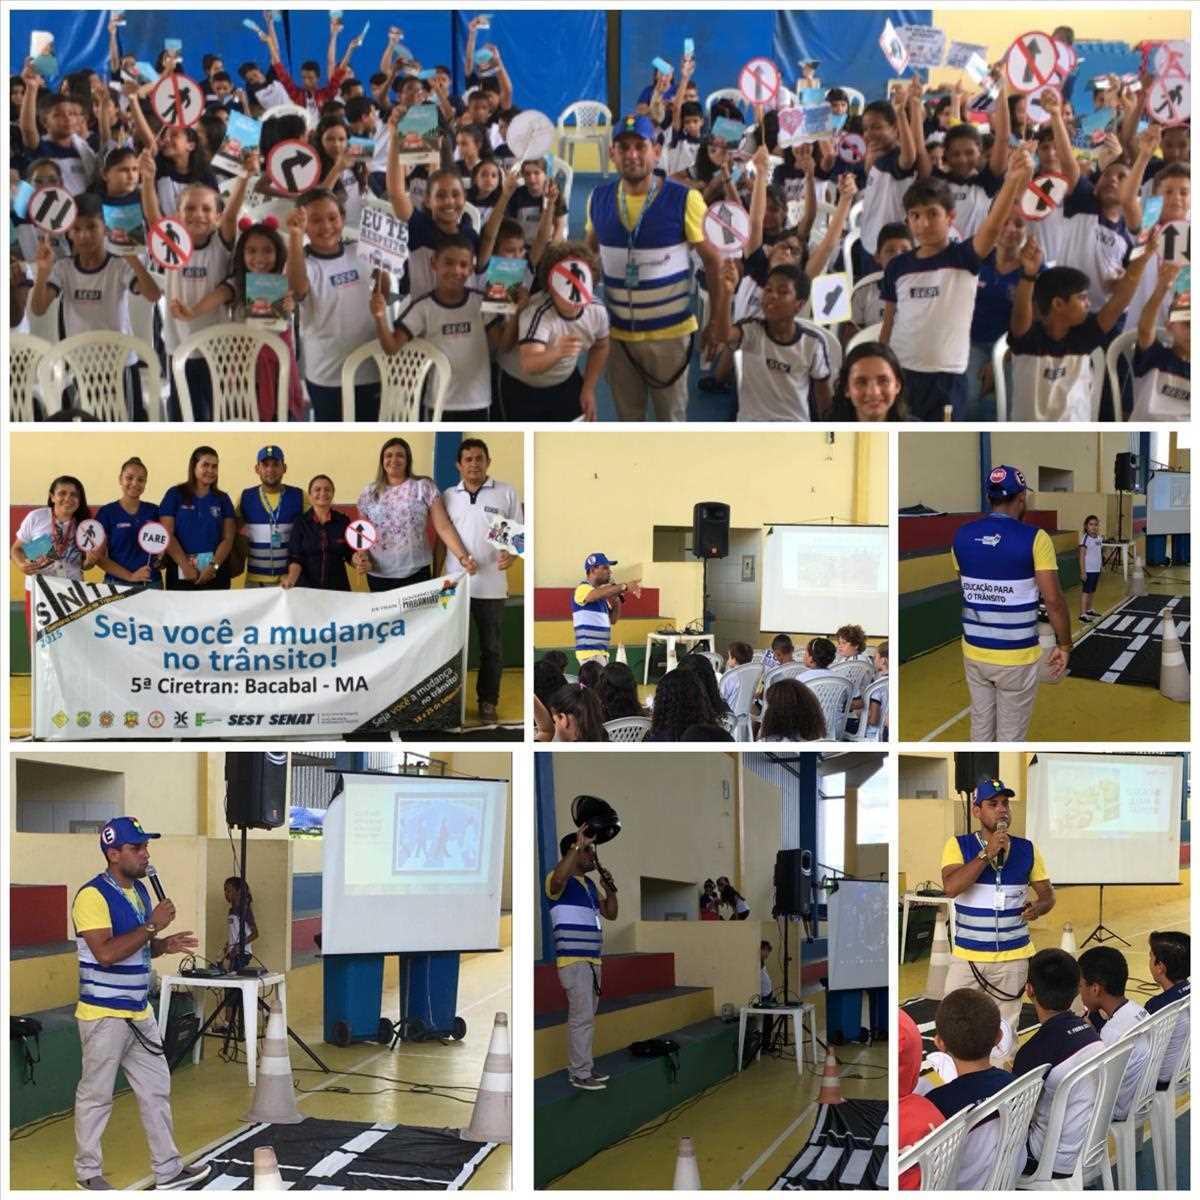 5ª Ciretran promove palestra no SESI de Bacabal